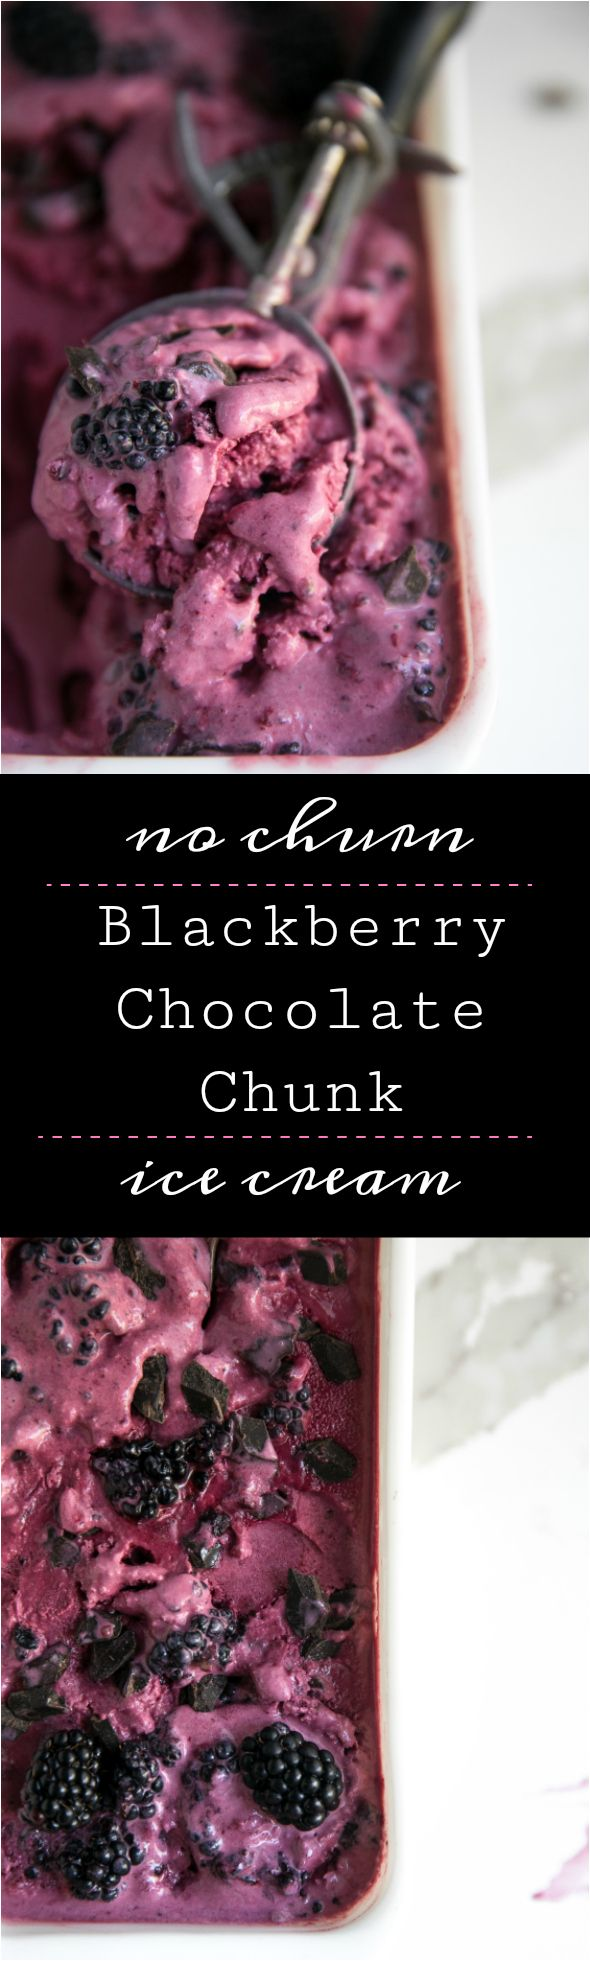 No Churn Blackberry Chocolate Chunk Ice Cream